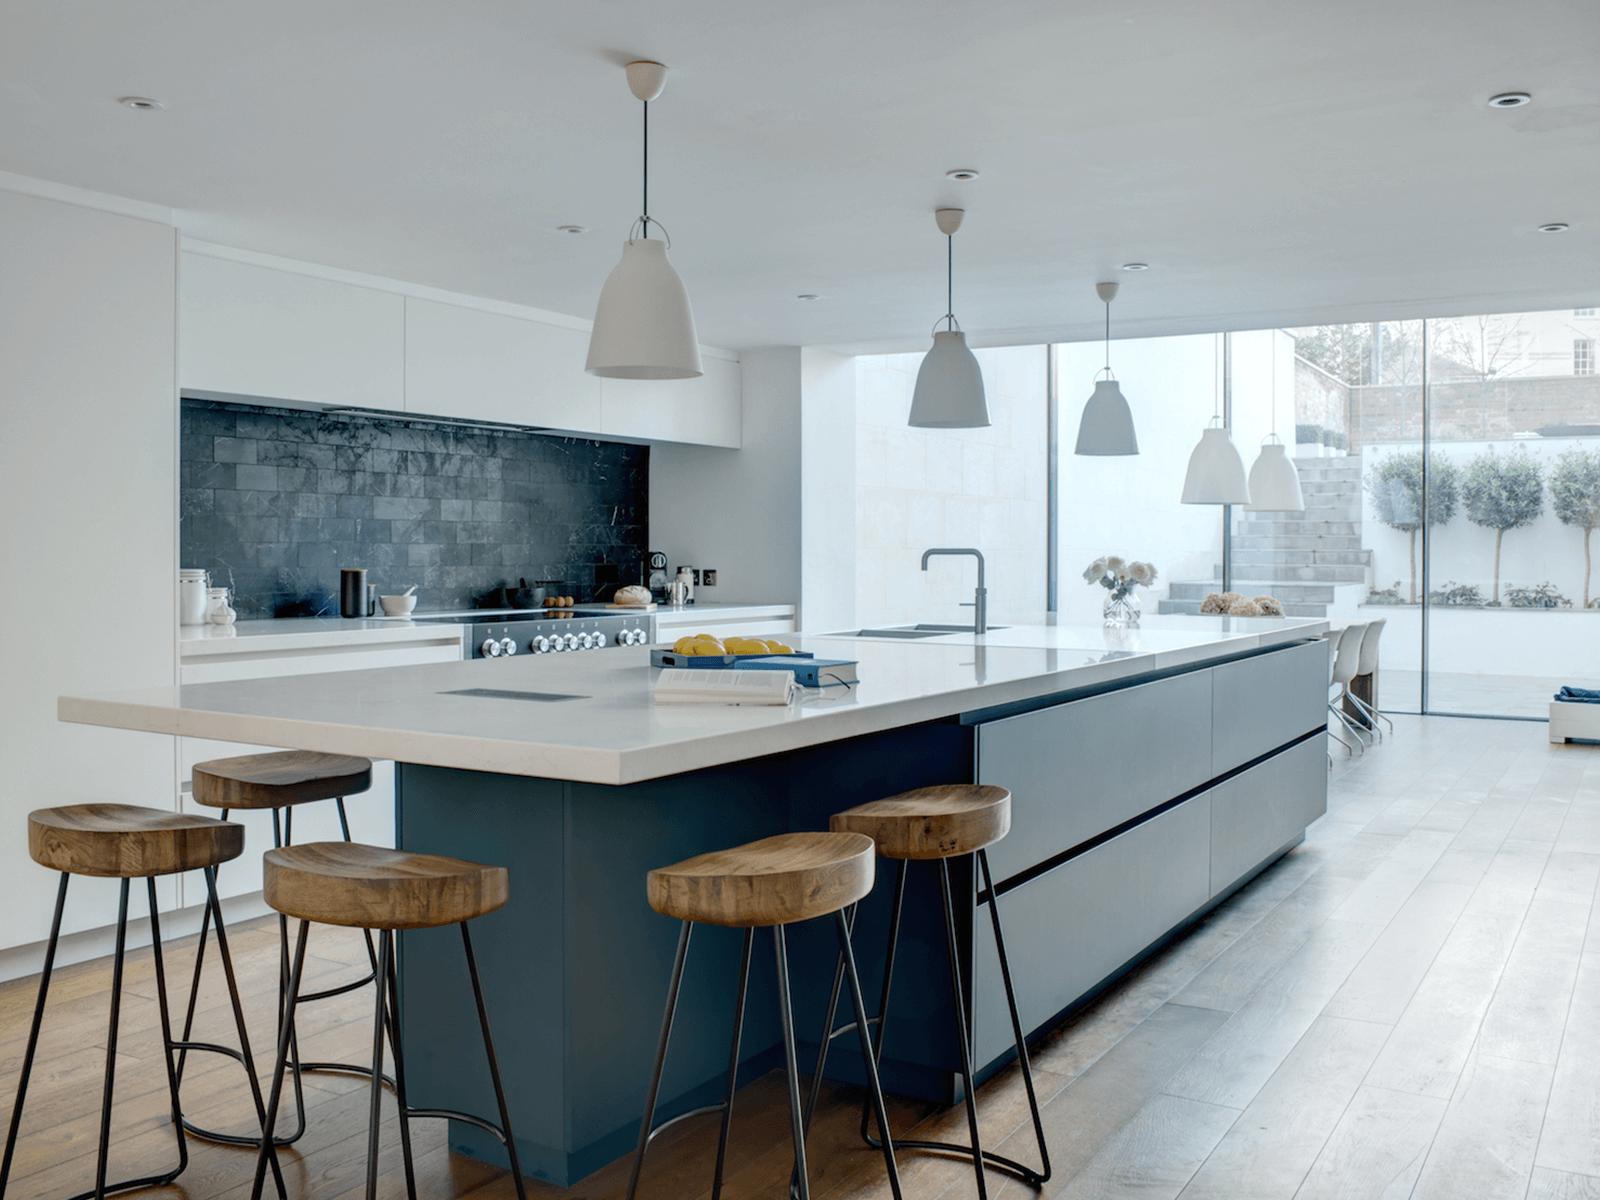 20 Small Kitchen Island Ideas on a Budget